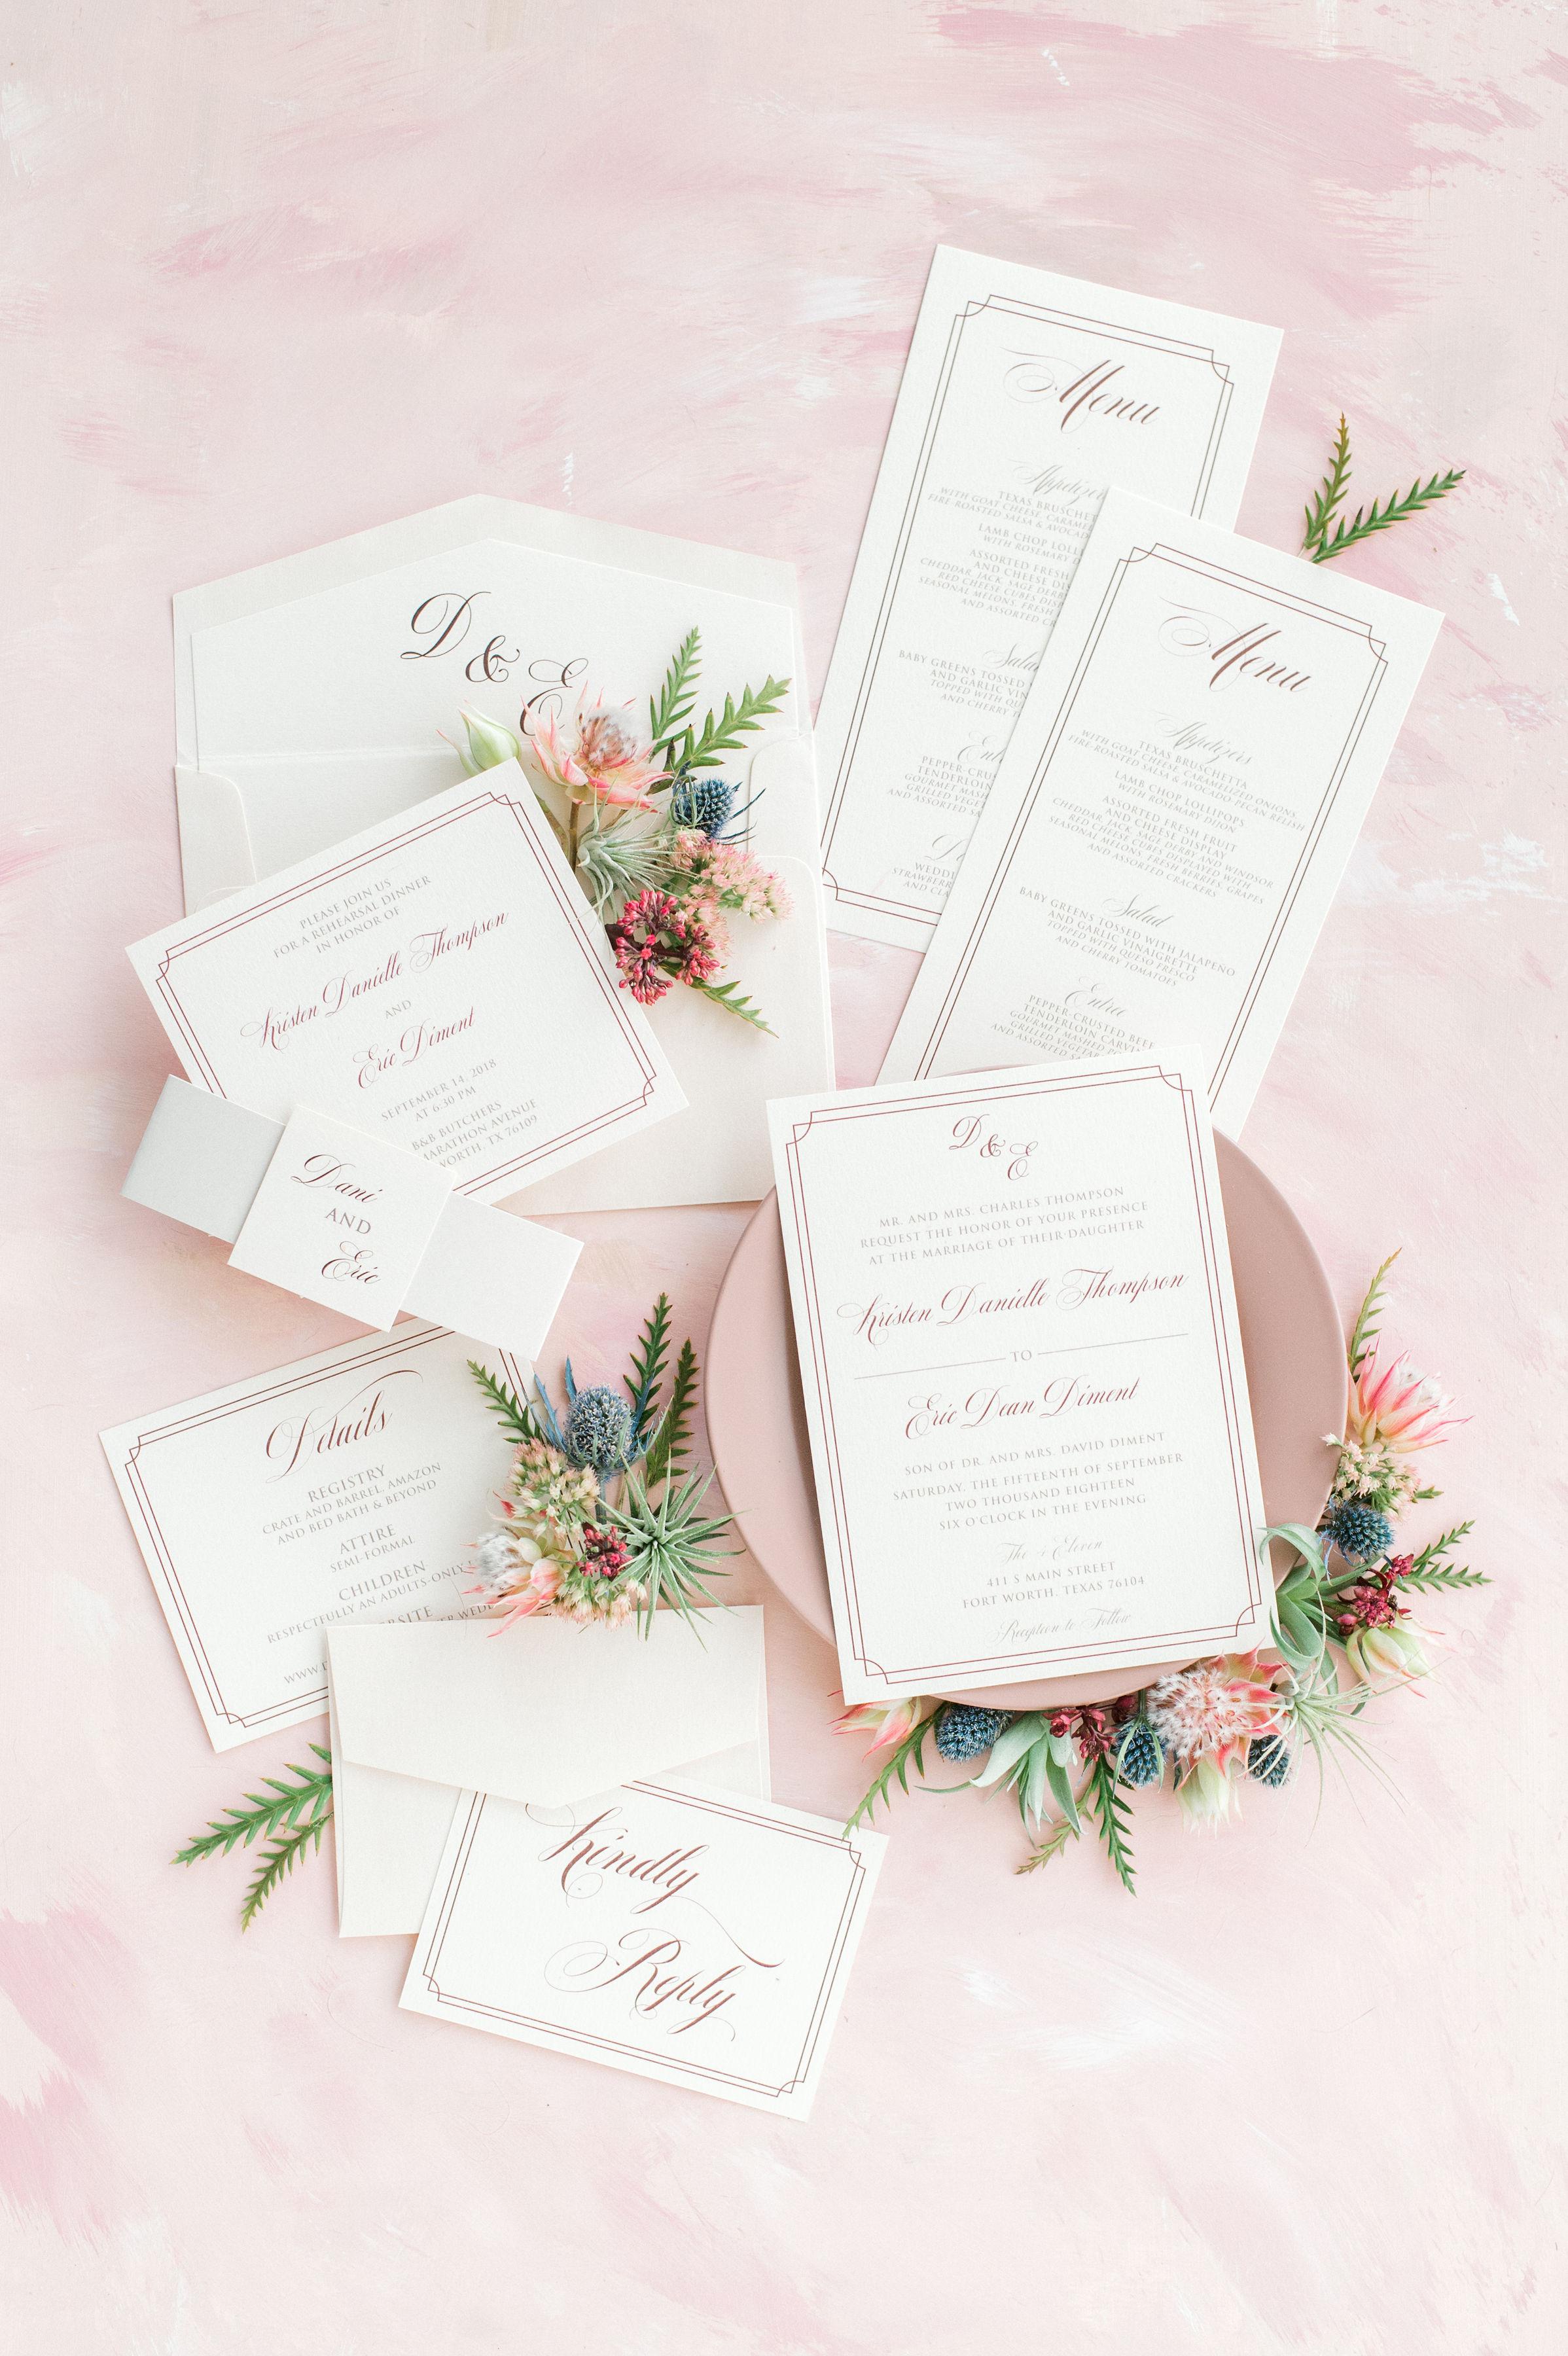 Formal Custom Wedding Invitation Suite | Industrial Bohemian Vintage Wedding Reception